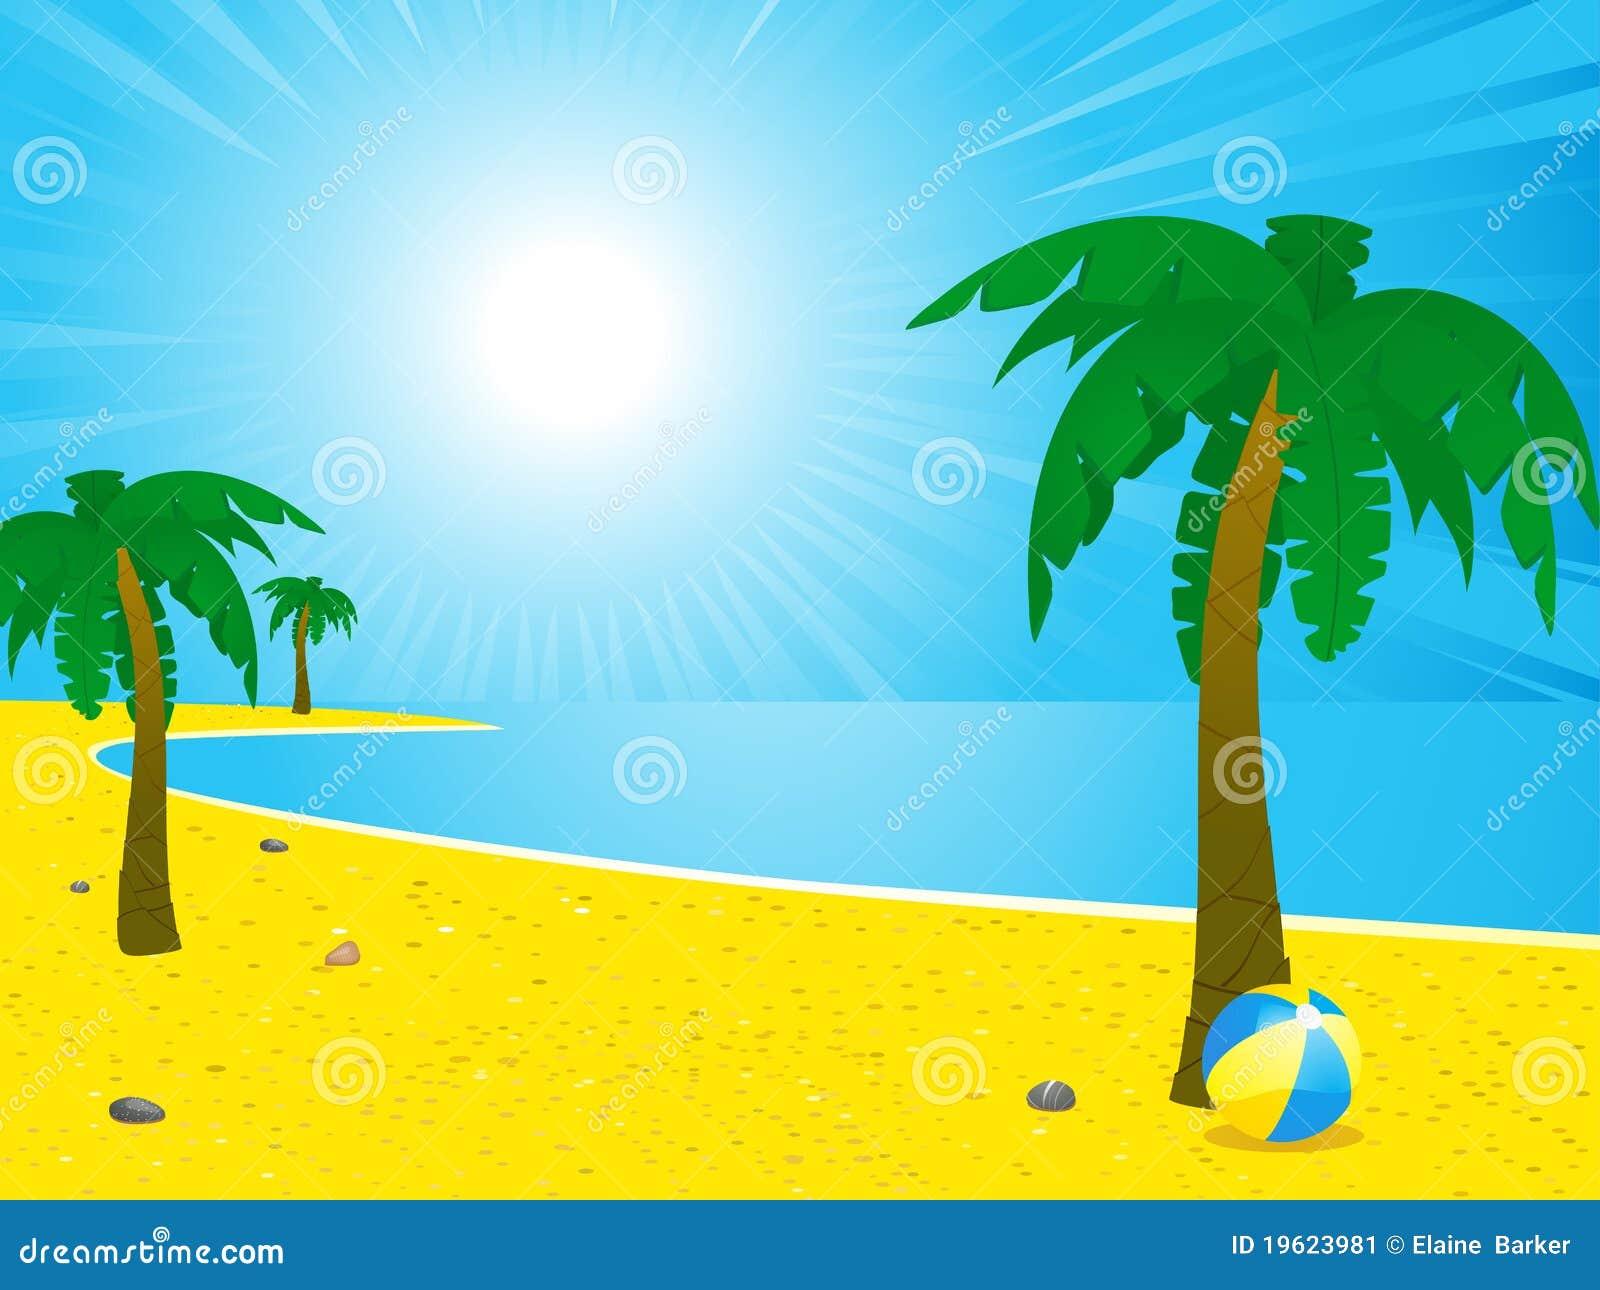 Playa Con Palmera Animada Fondos De Pantalla